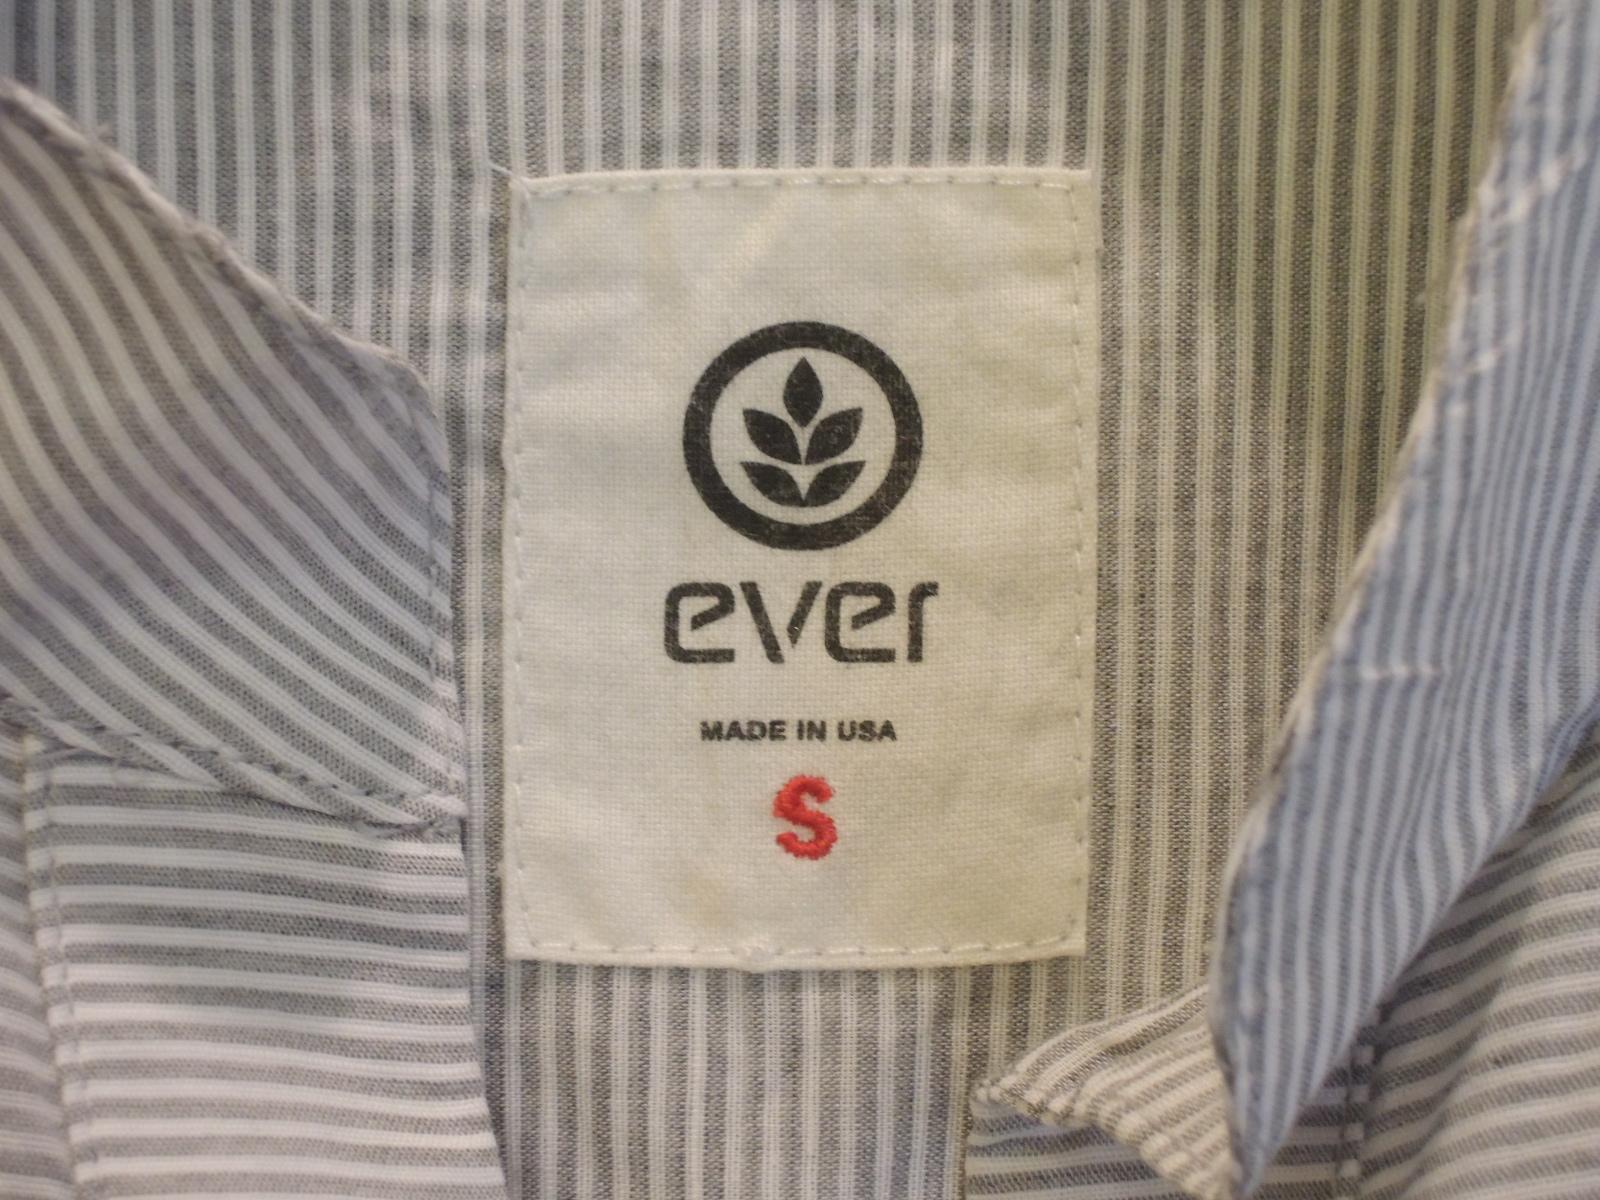 evershirts04.JPG